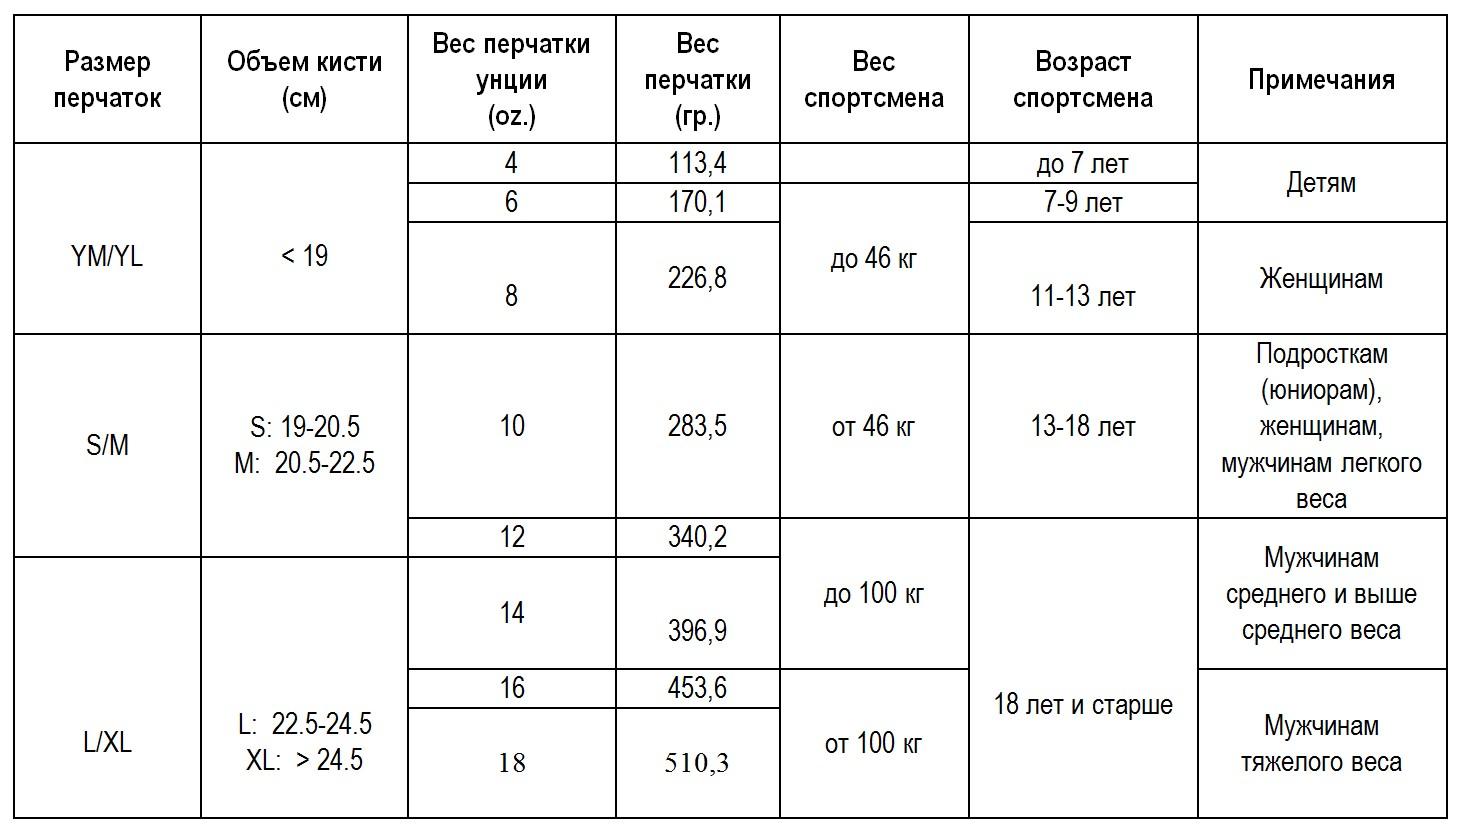 таблица размеров перчаток.png